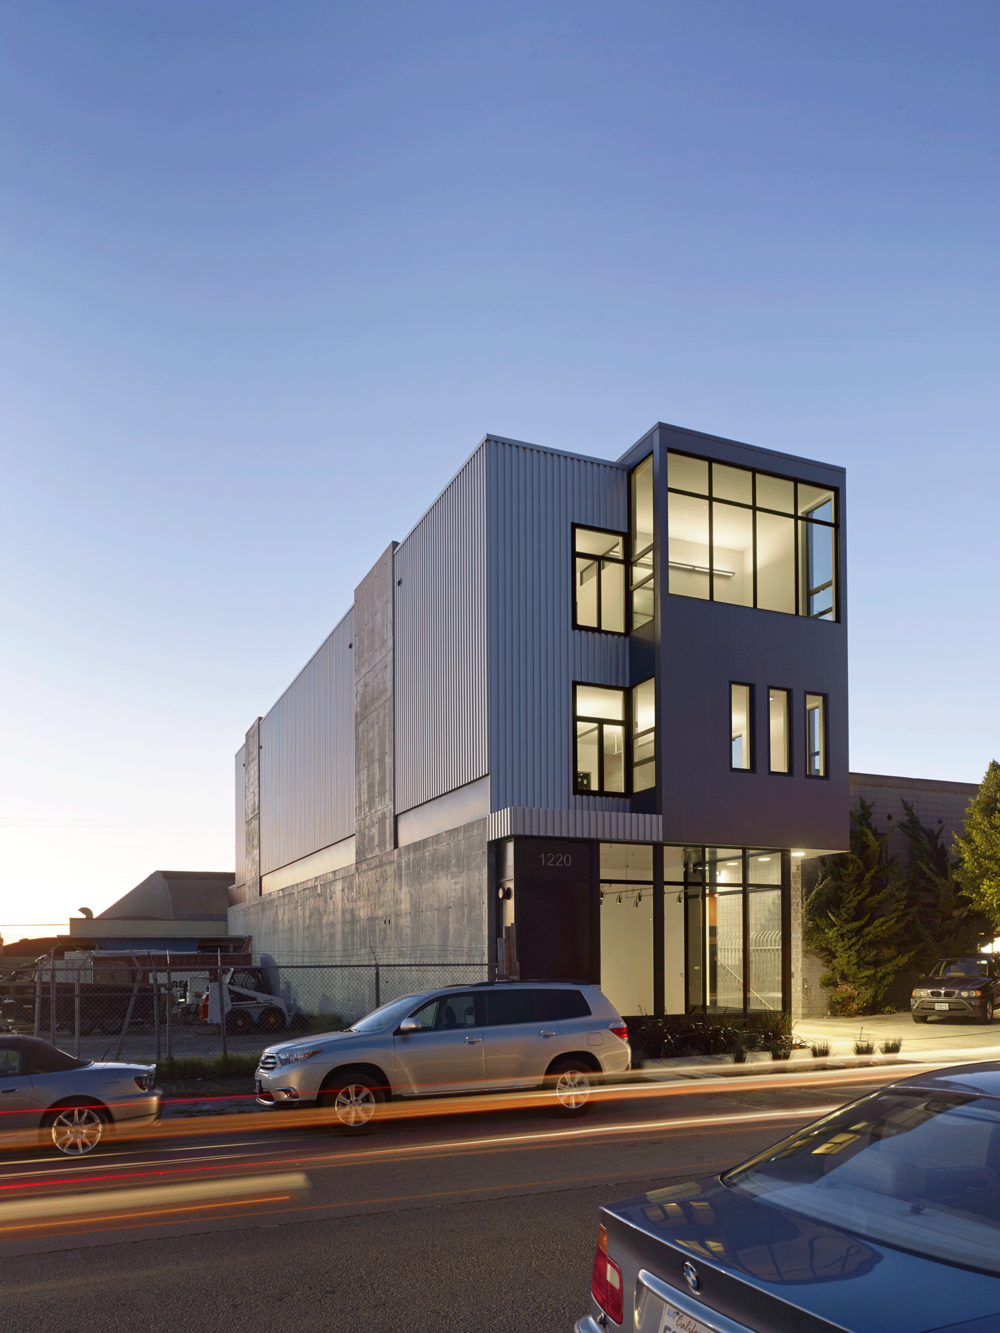 Architect: Ware Associates Structural Design: Ware Associates Contractor / Owner: Michael Dennison Photography: Cesar Rubio